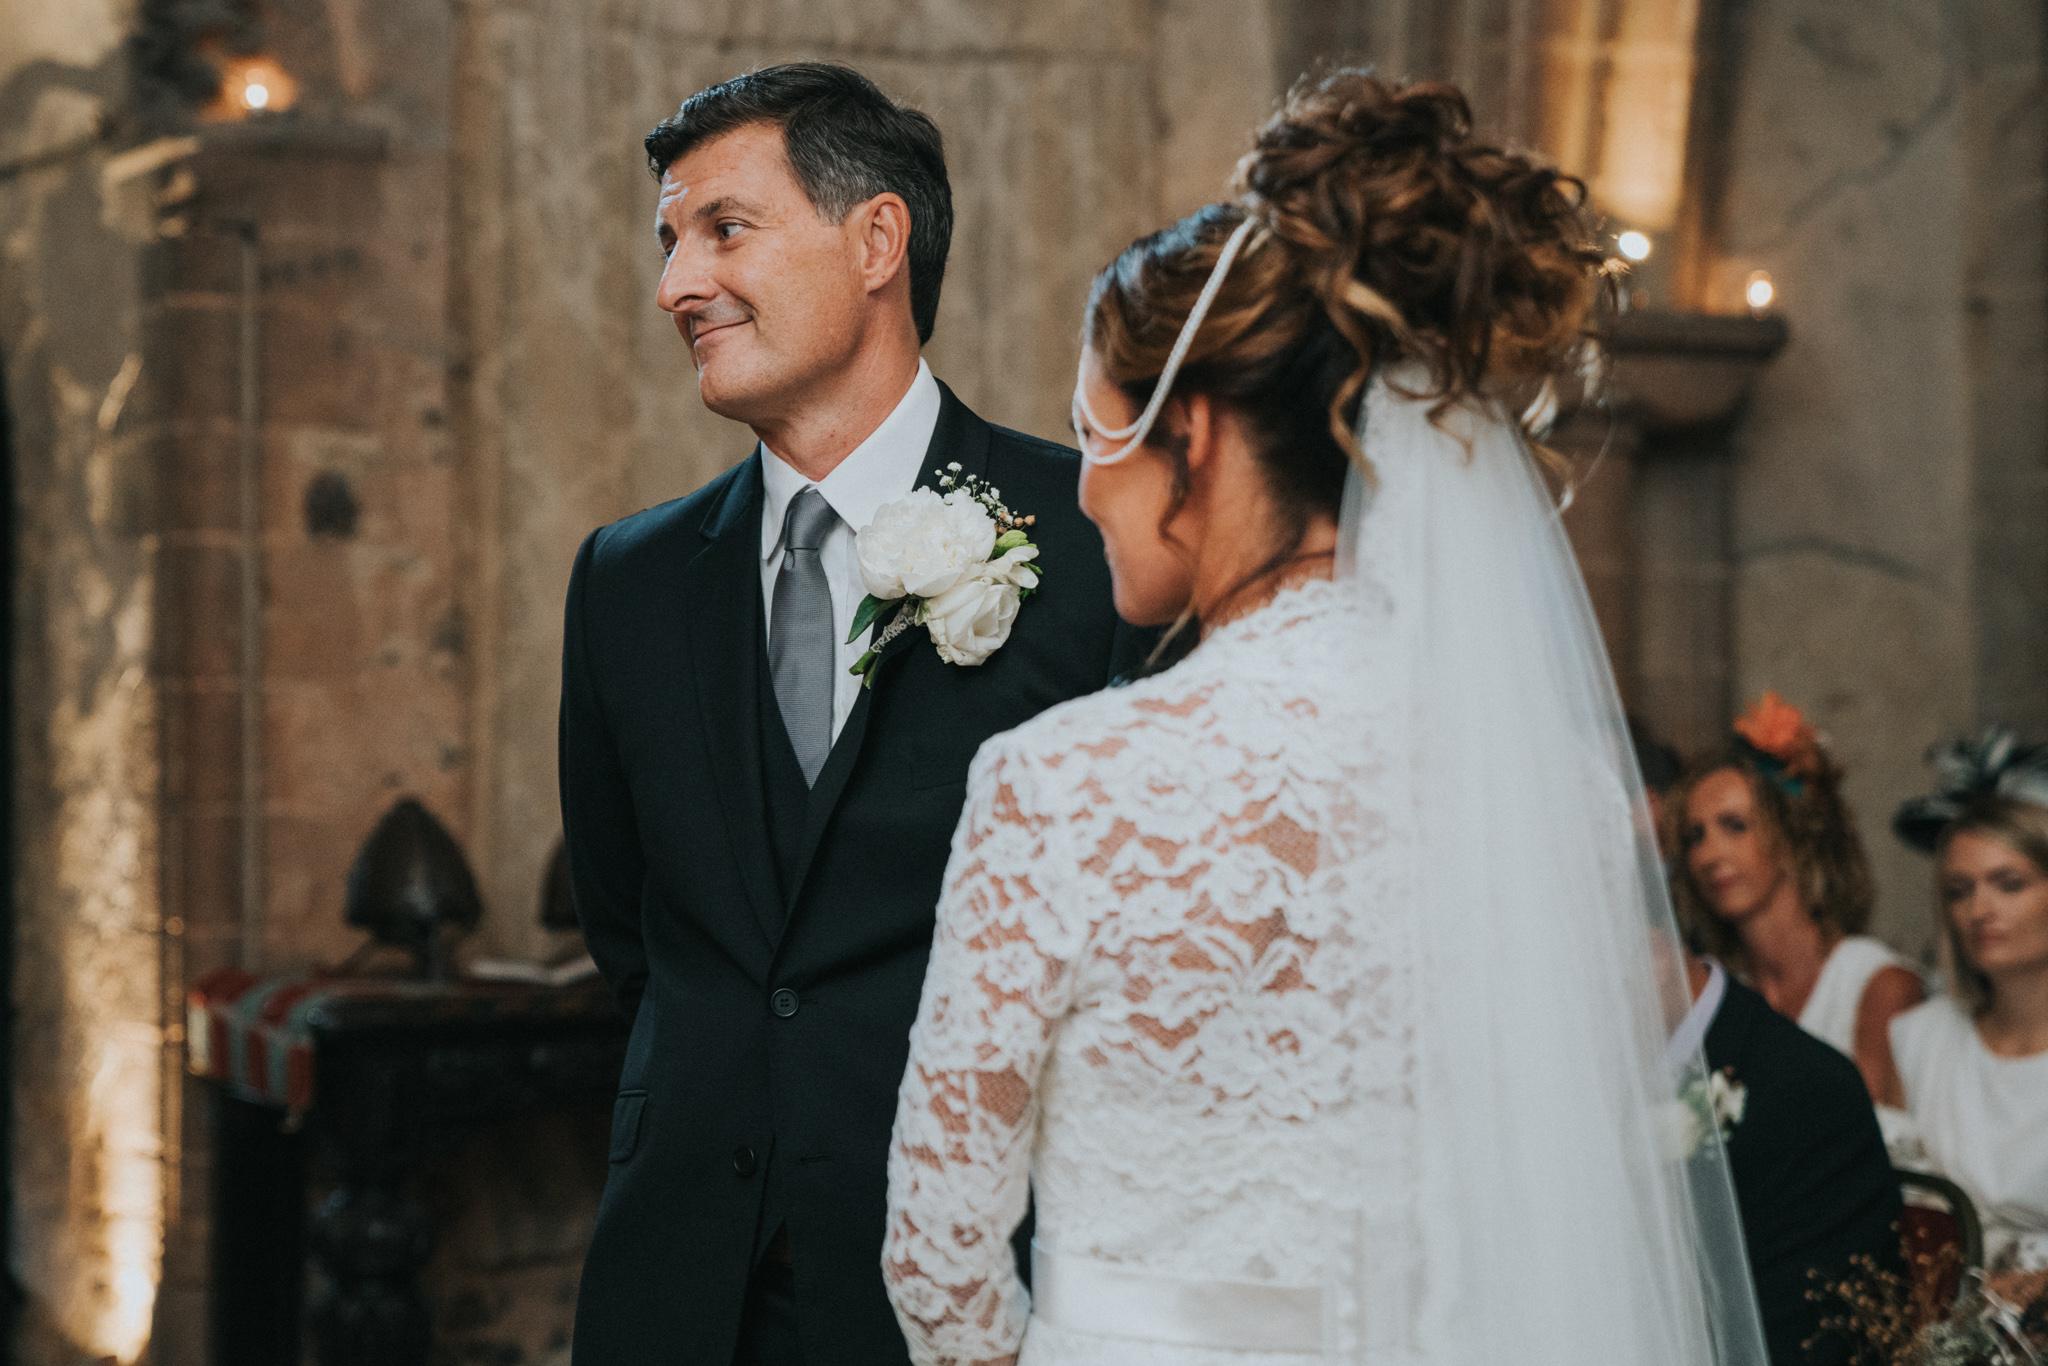 grace-elizabeth-boho-wedding-headingham-castle-essex-wedding-photographer-35.jpg